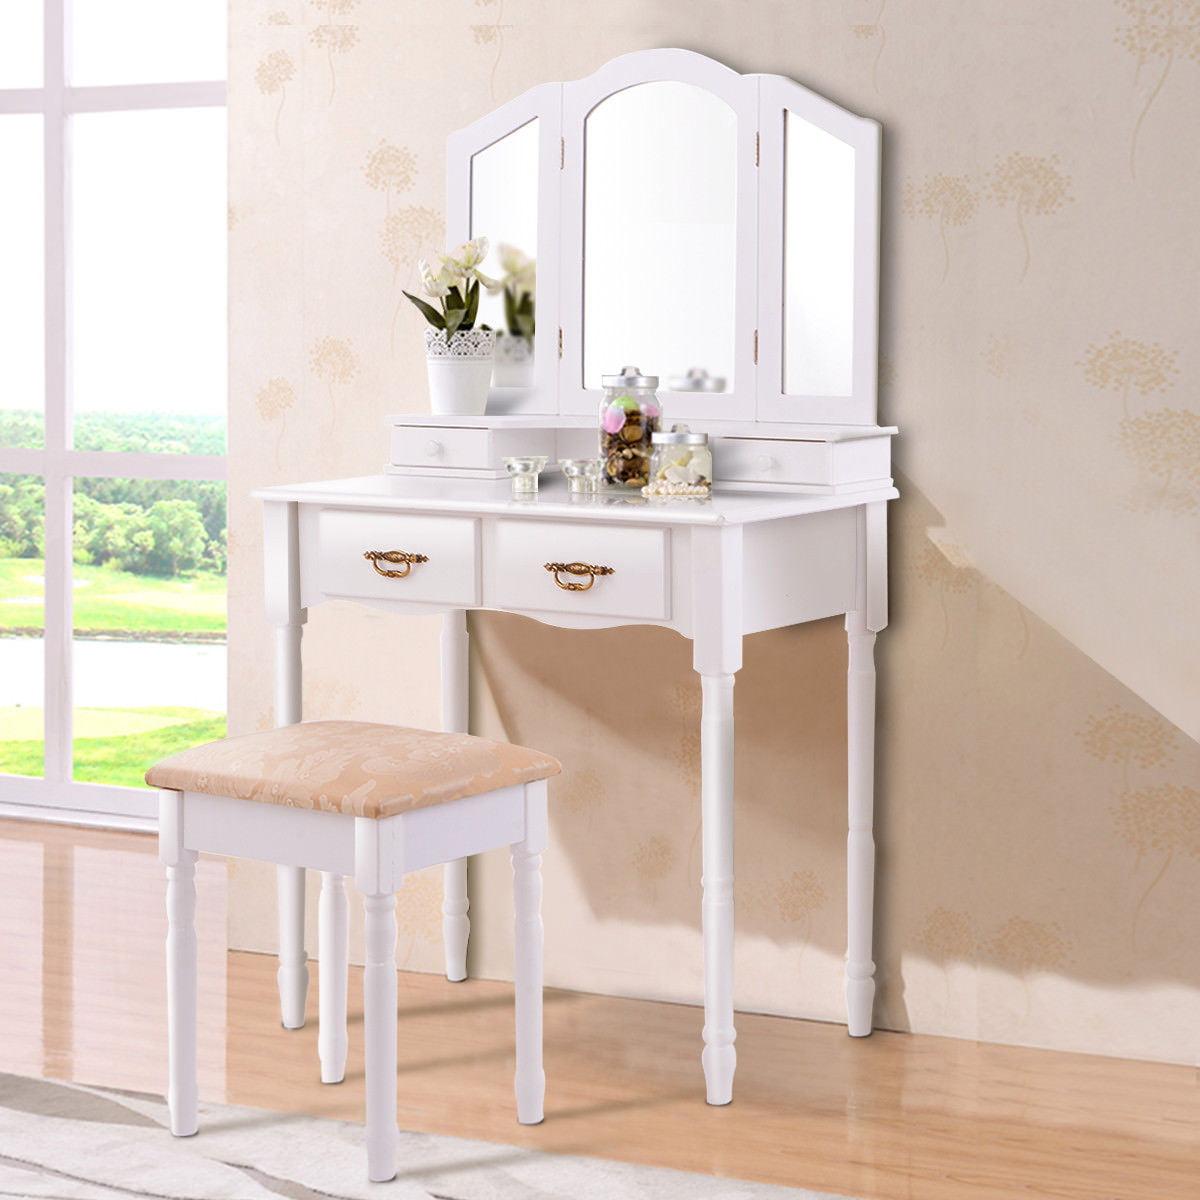 Costway White Tri Folding Mirror Vanity Makeup Table Stool Set bathroom W/4 Drawers